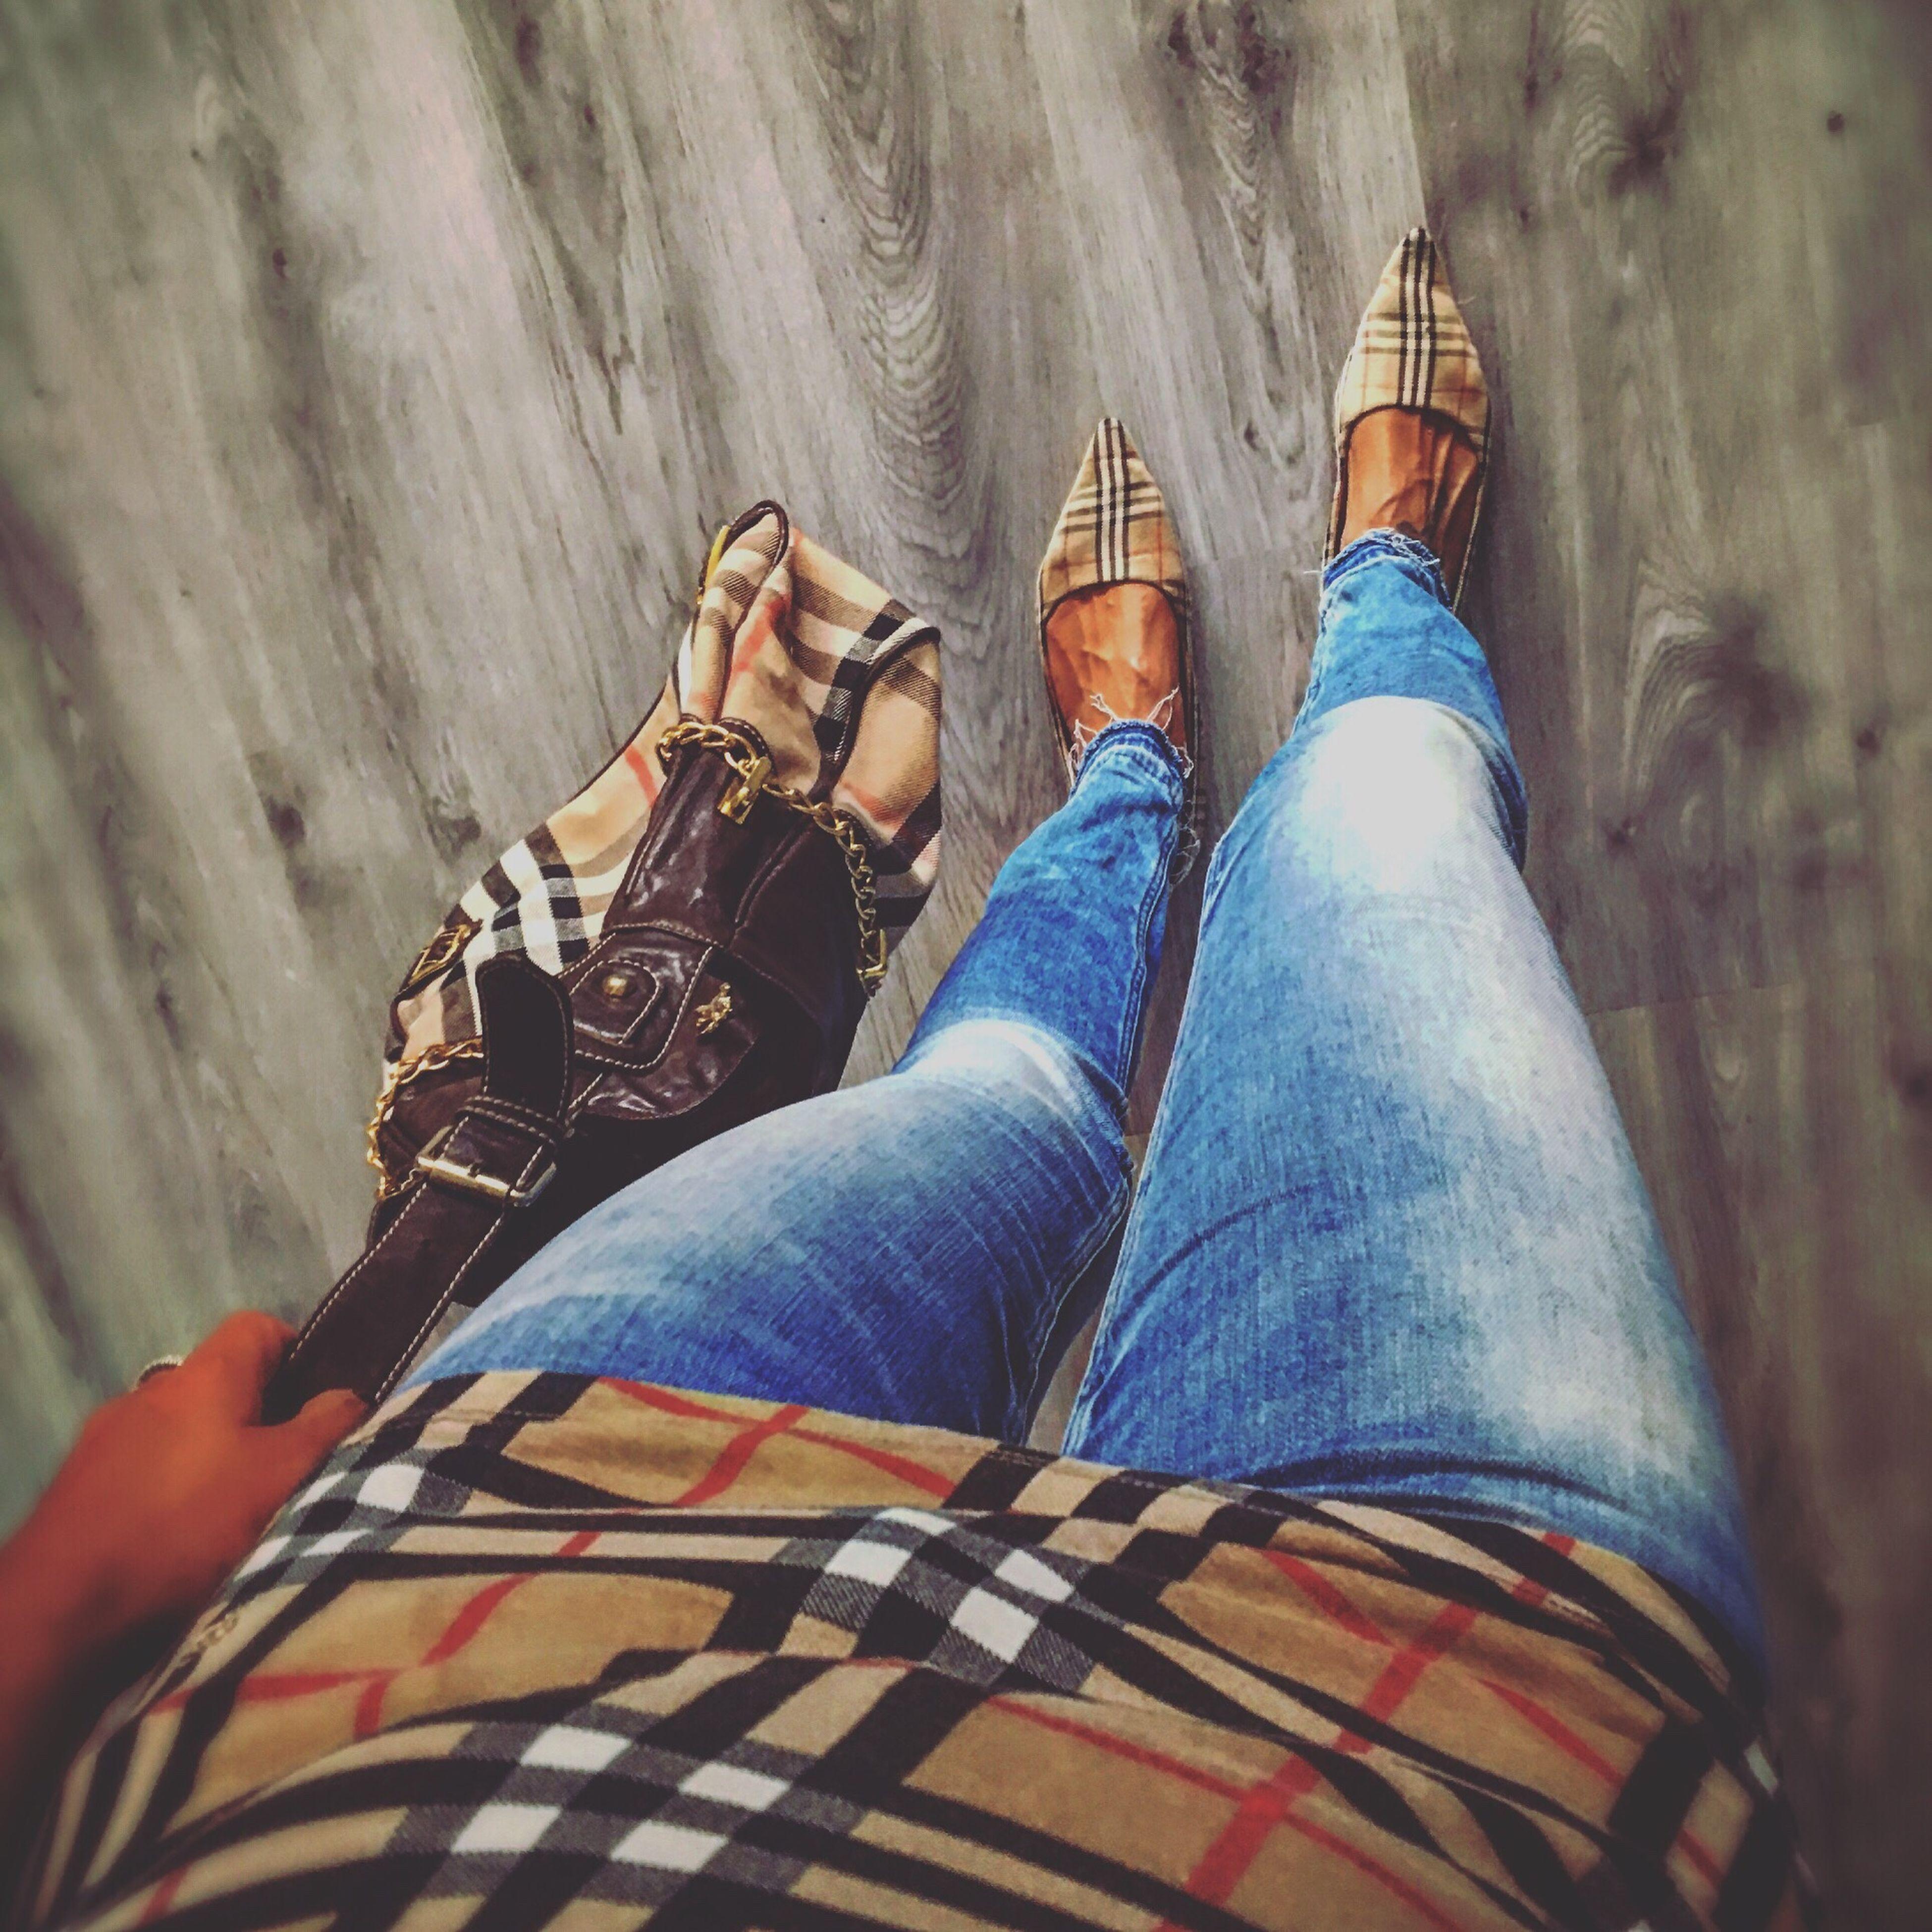 GoingOut Bag Brand Shoes Daily Selfie Fashion Woman Gettingeady